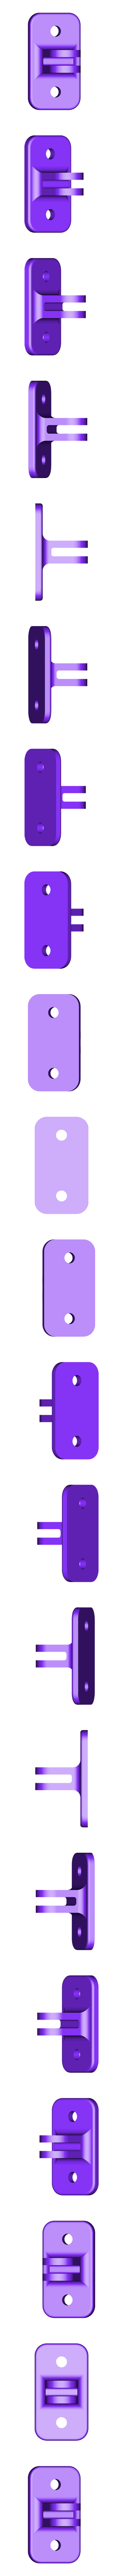 GIE KRAFT A002 007 Chape.stl Download free STL file 5.8GHz Transmitter Holder with Miniature Camera • 3D printable object, JJB